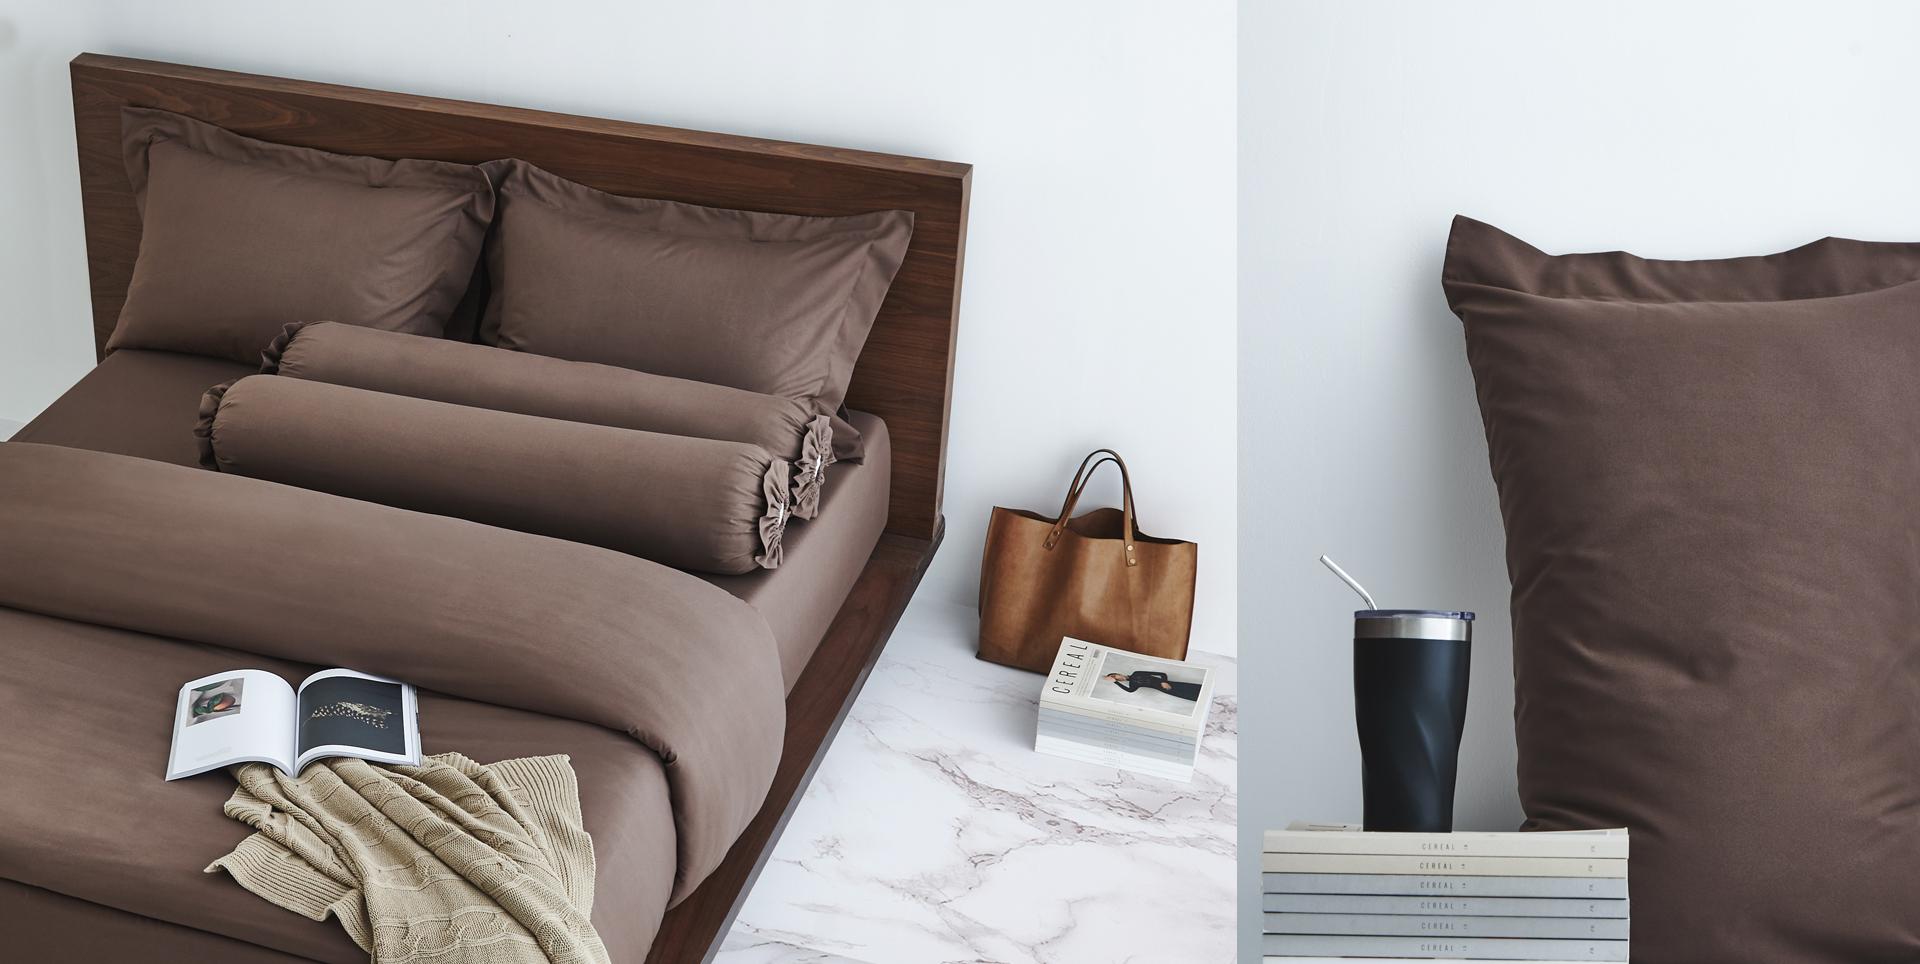 Lotusattitude - chocolate ชุดผ้าปูที่นอนพร้อมผ้านวม